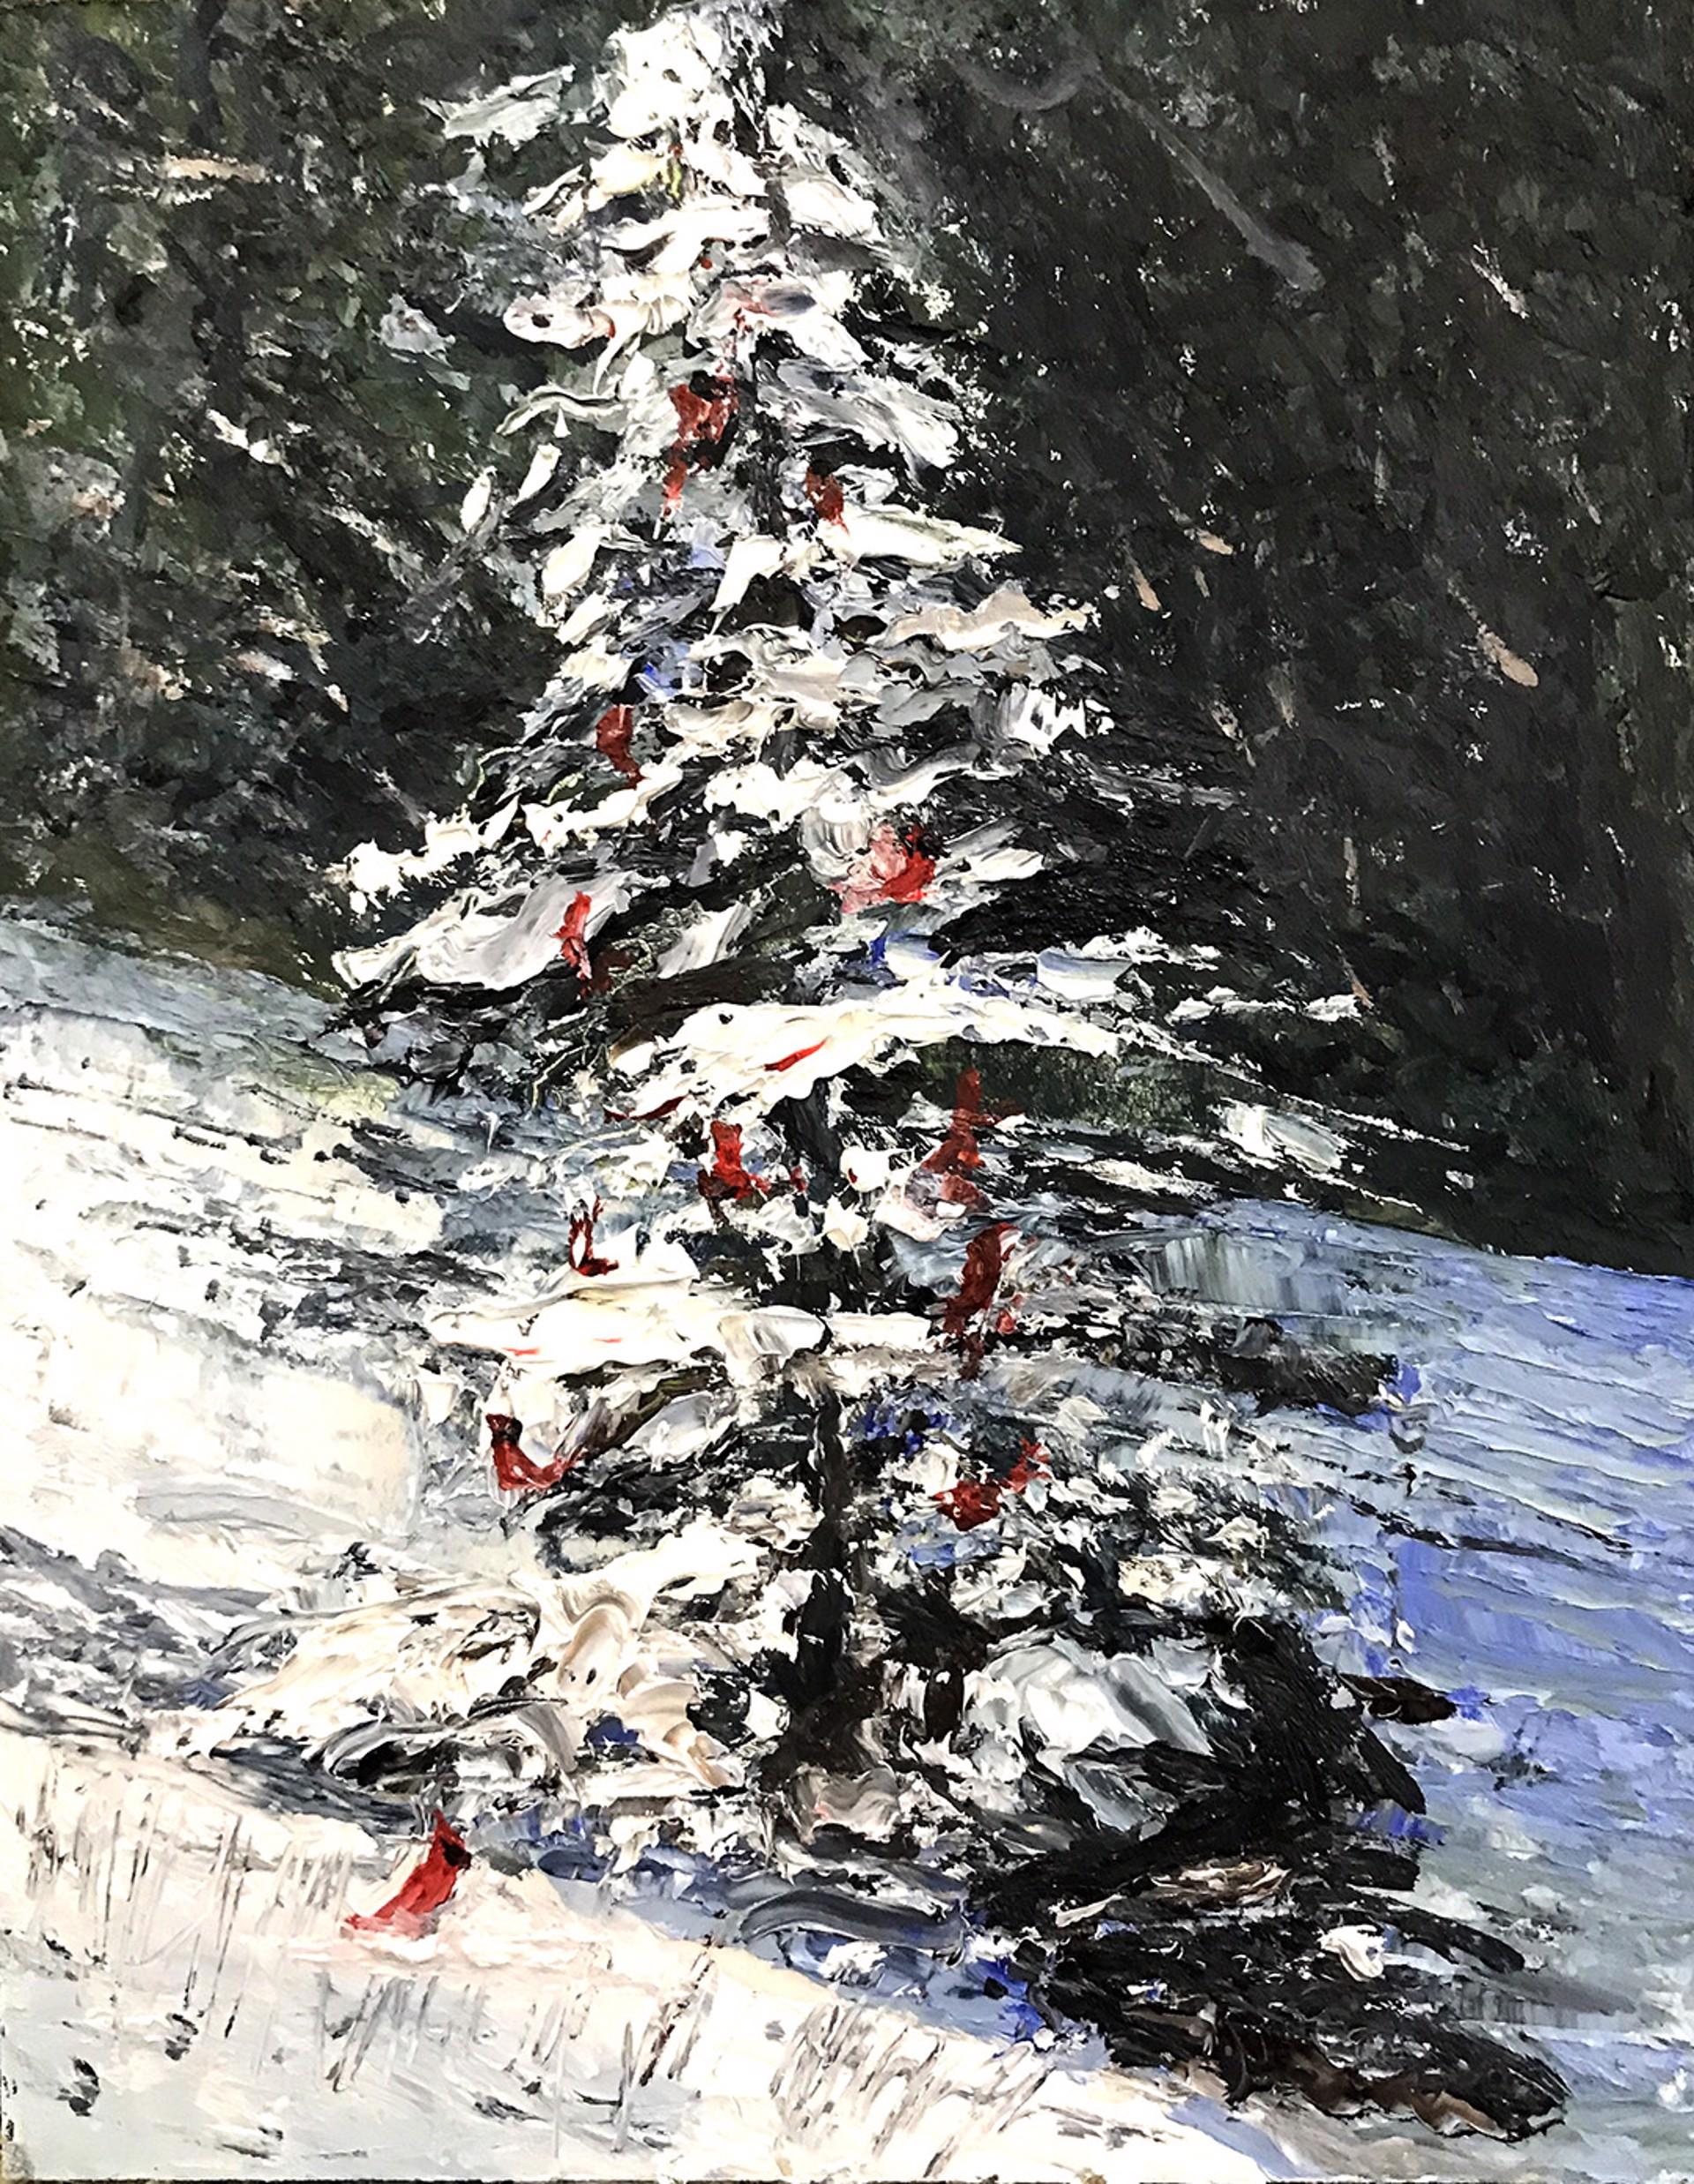 A Cardinal Christmas by Frank Baggett